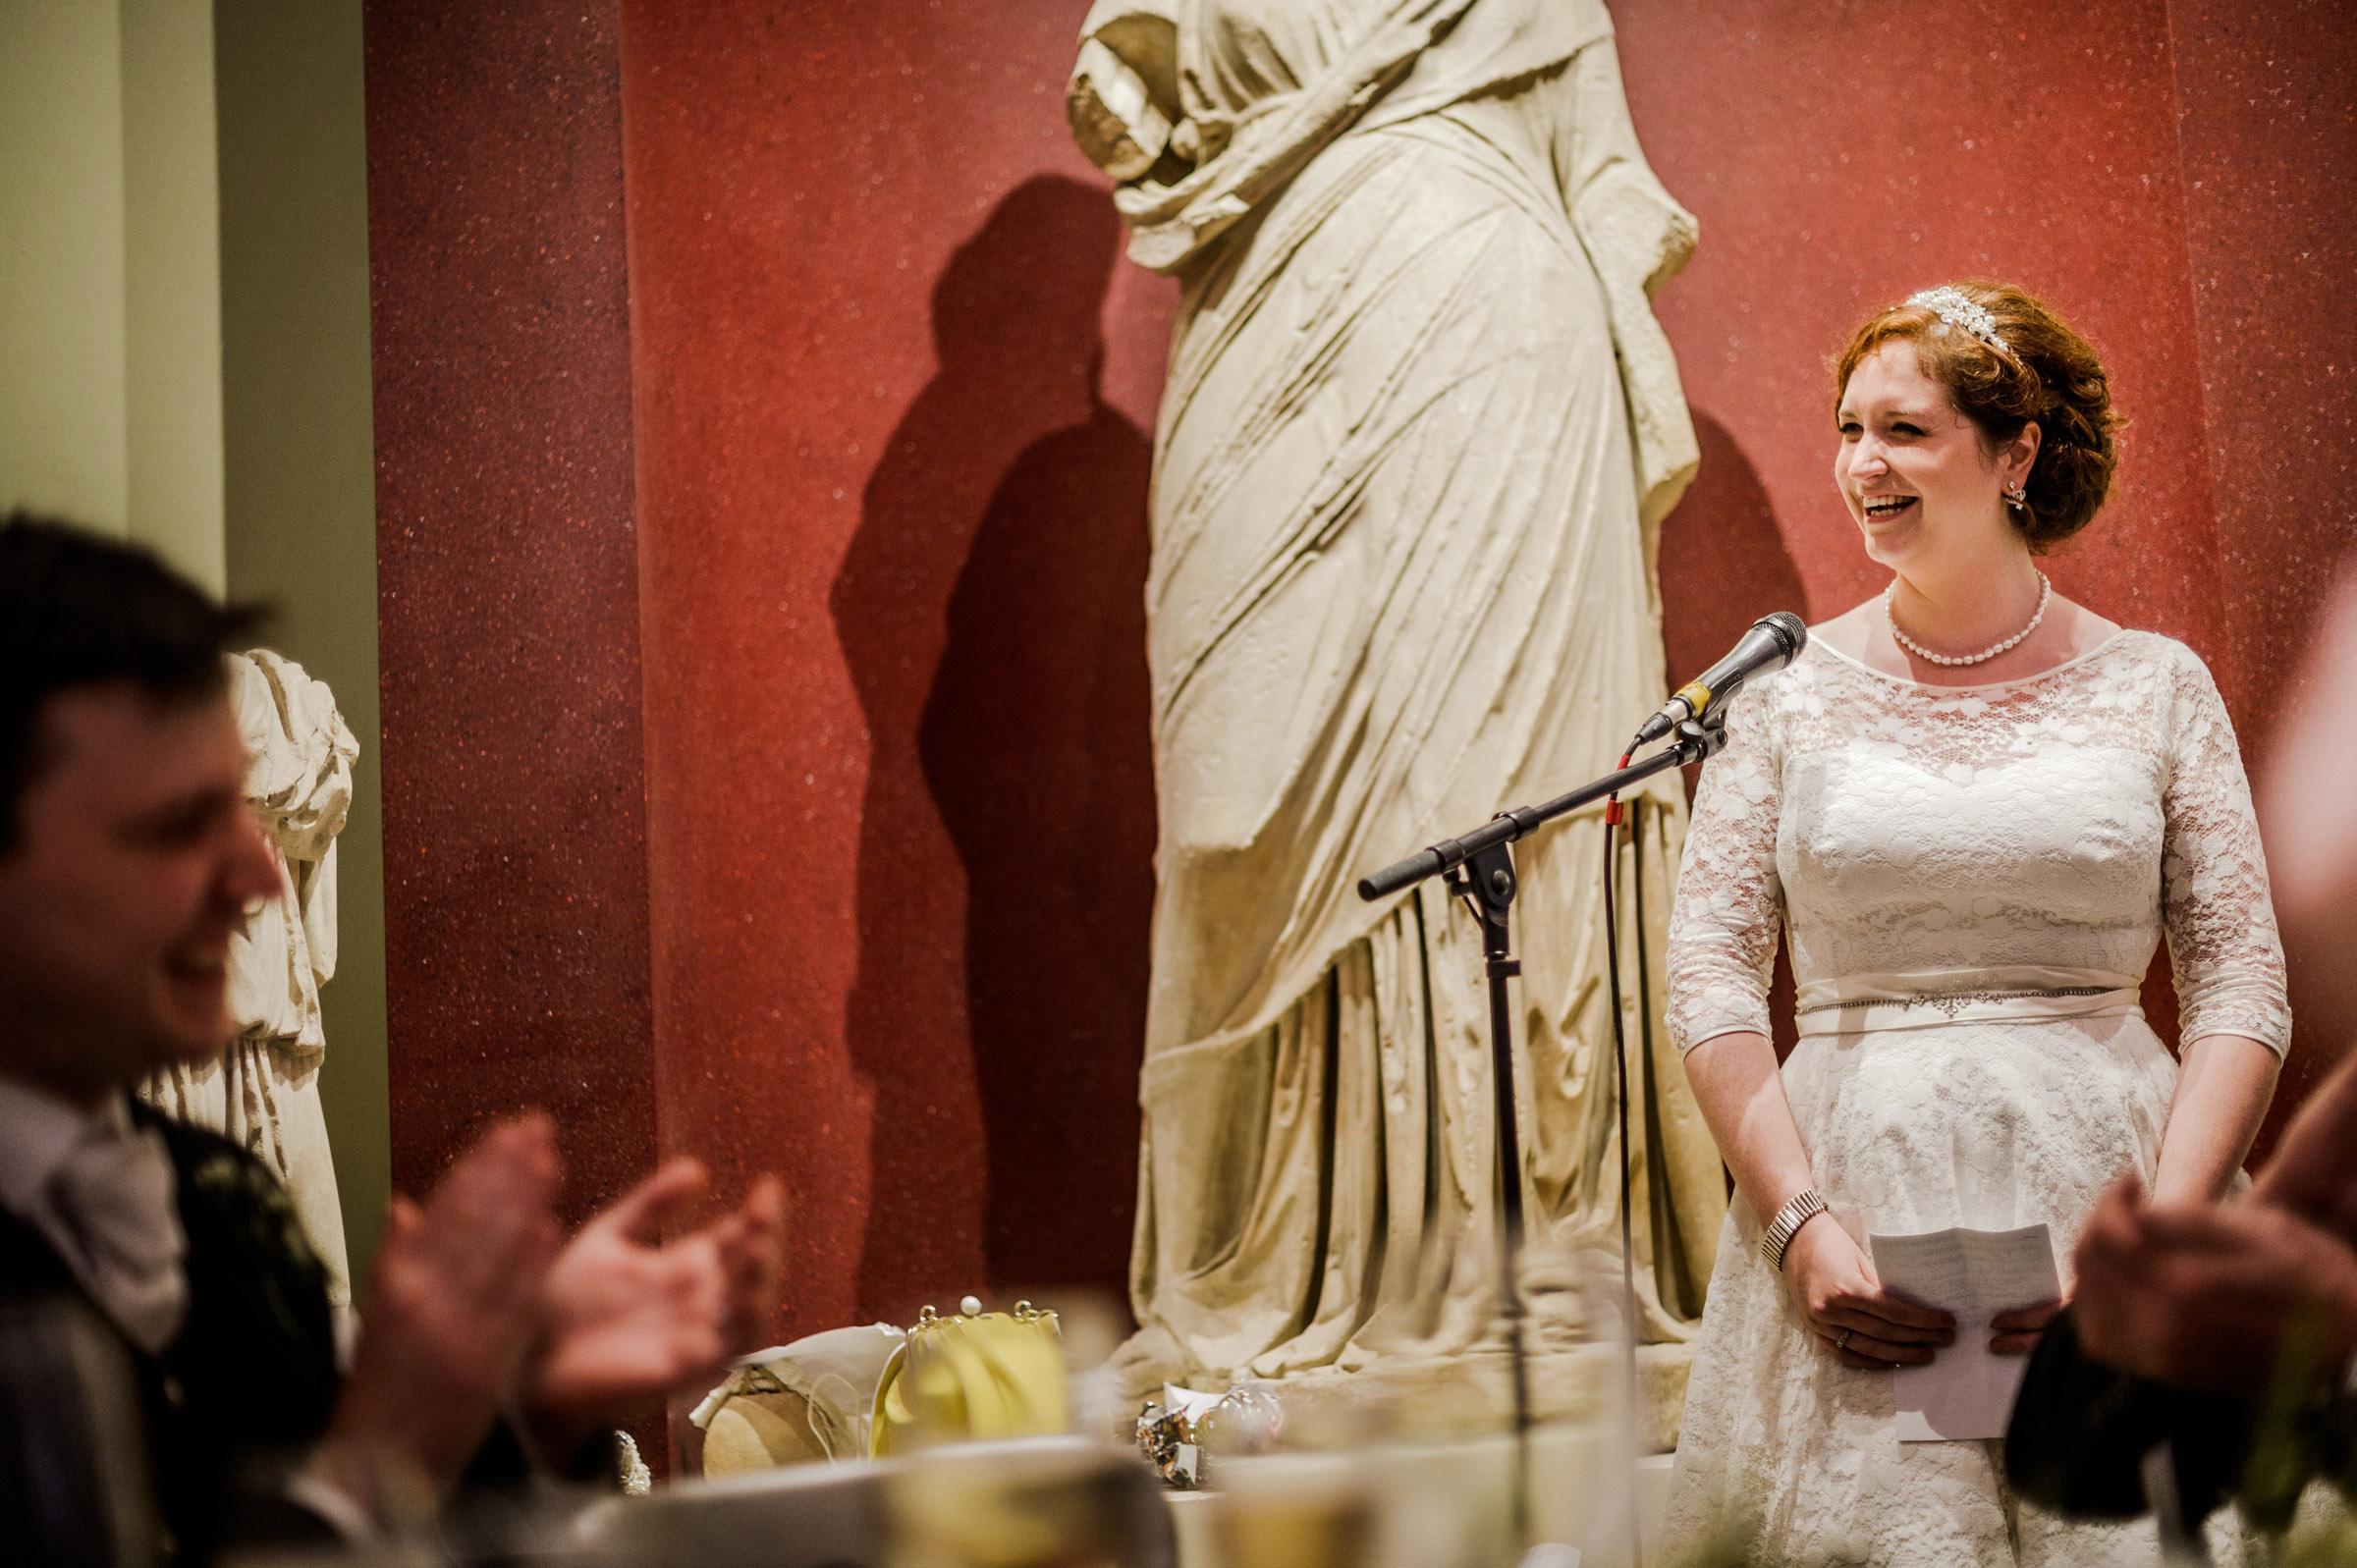 Ashmolean-Museum-Wedding-Pictures-0055.jpg